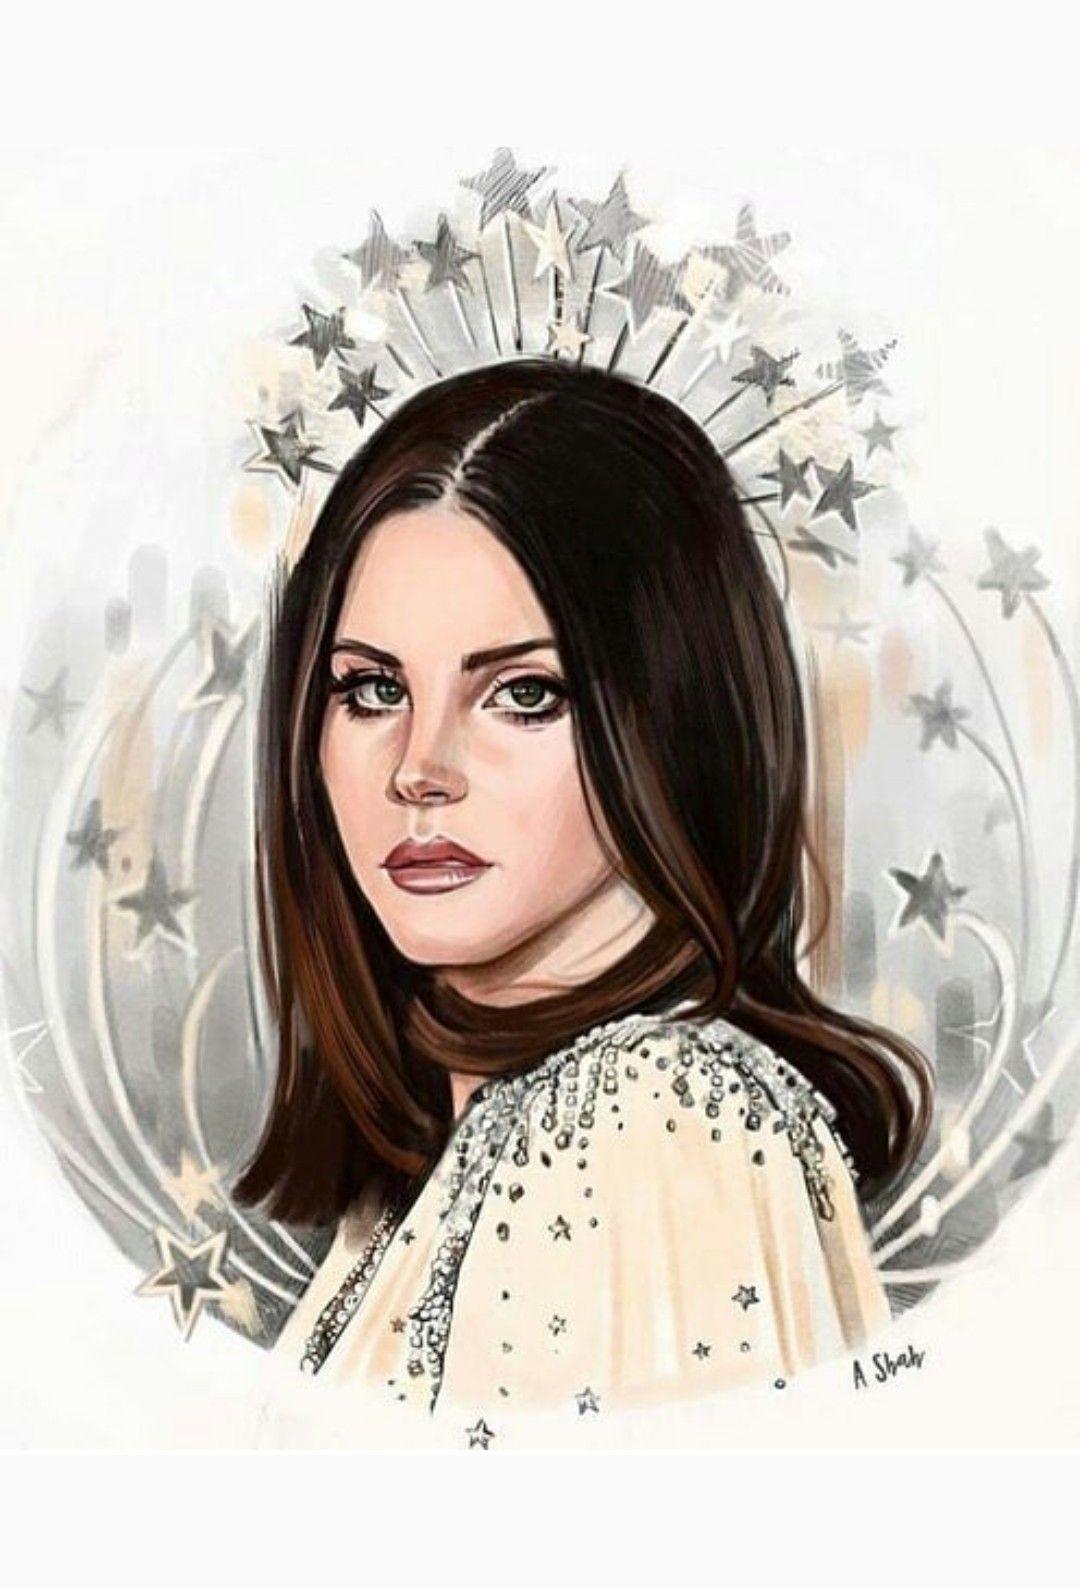 Lana Del Rey ($14 Million)